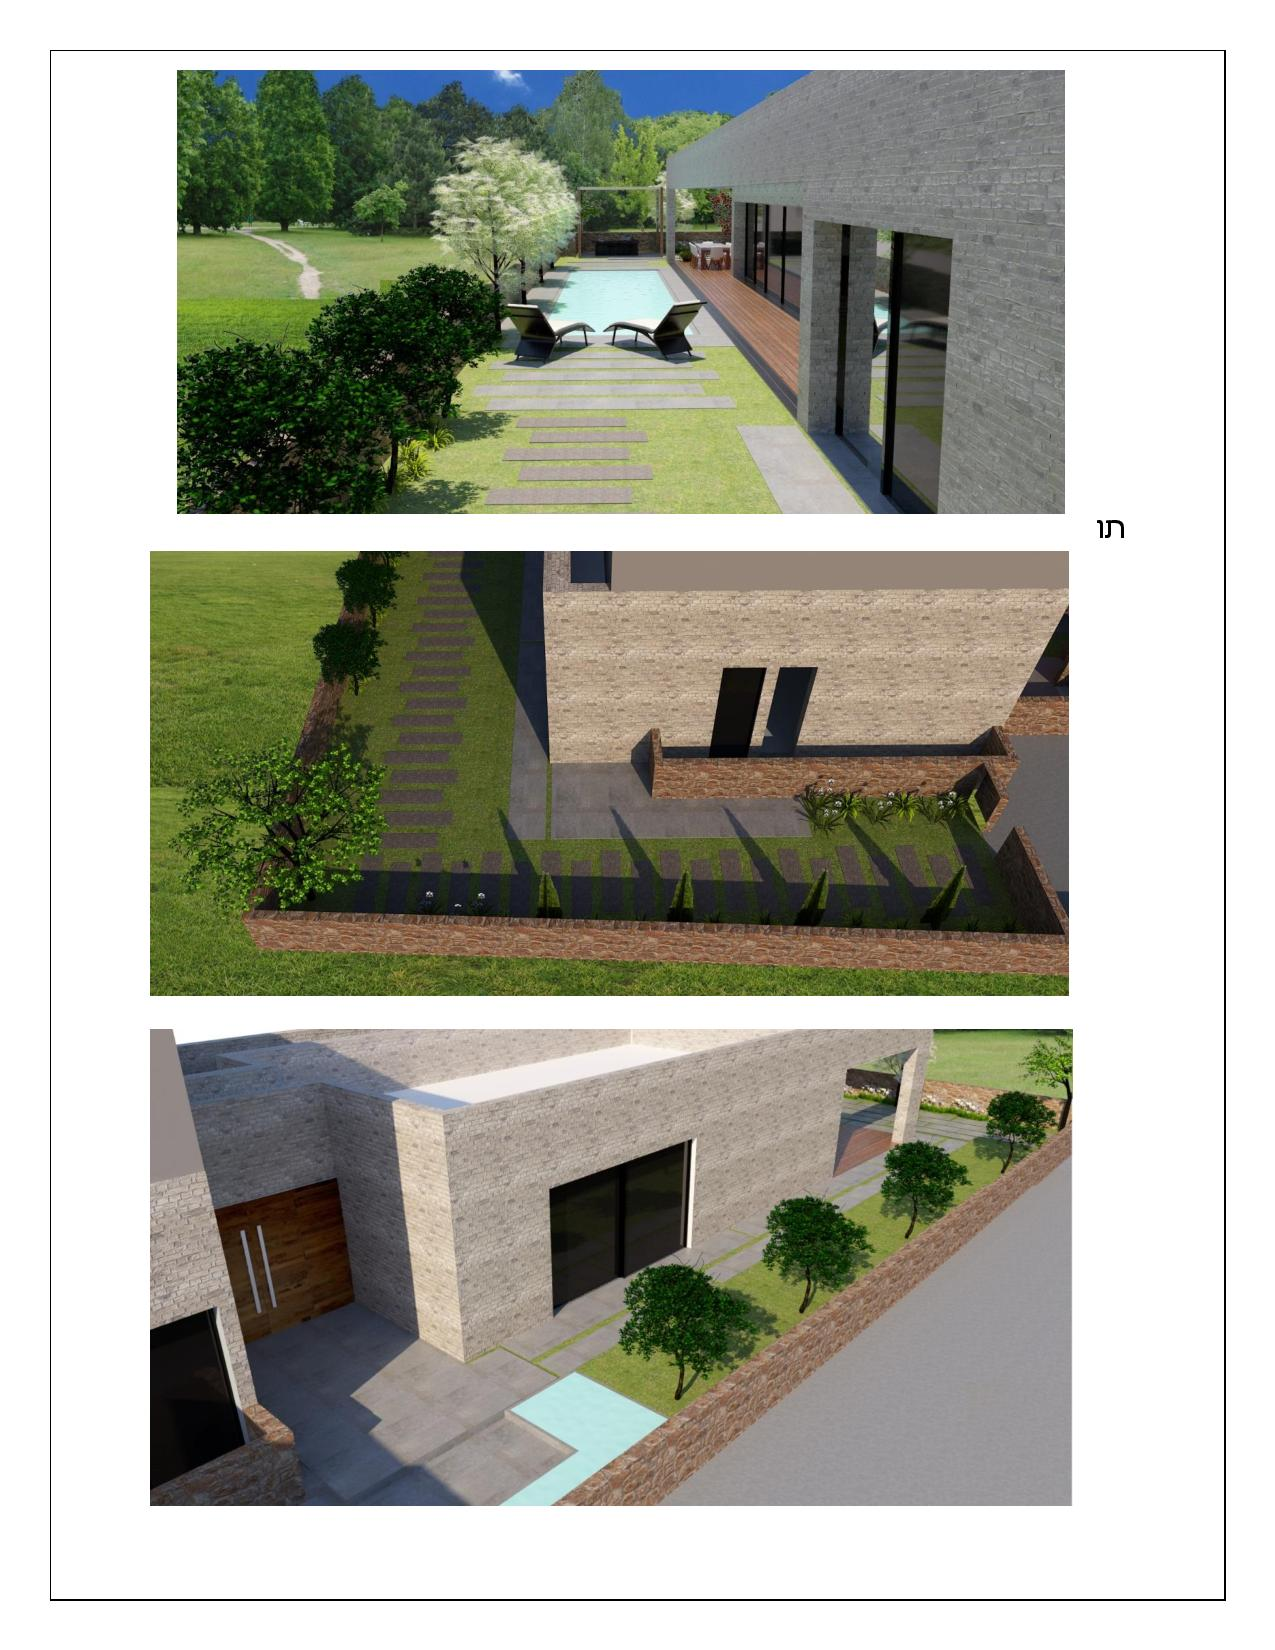 Document page 005 - דוגמא להצעת מחיר עבור עיצוב גינה